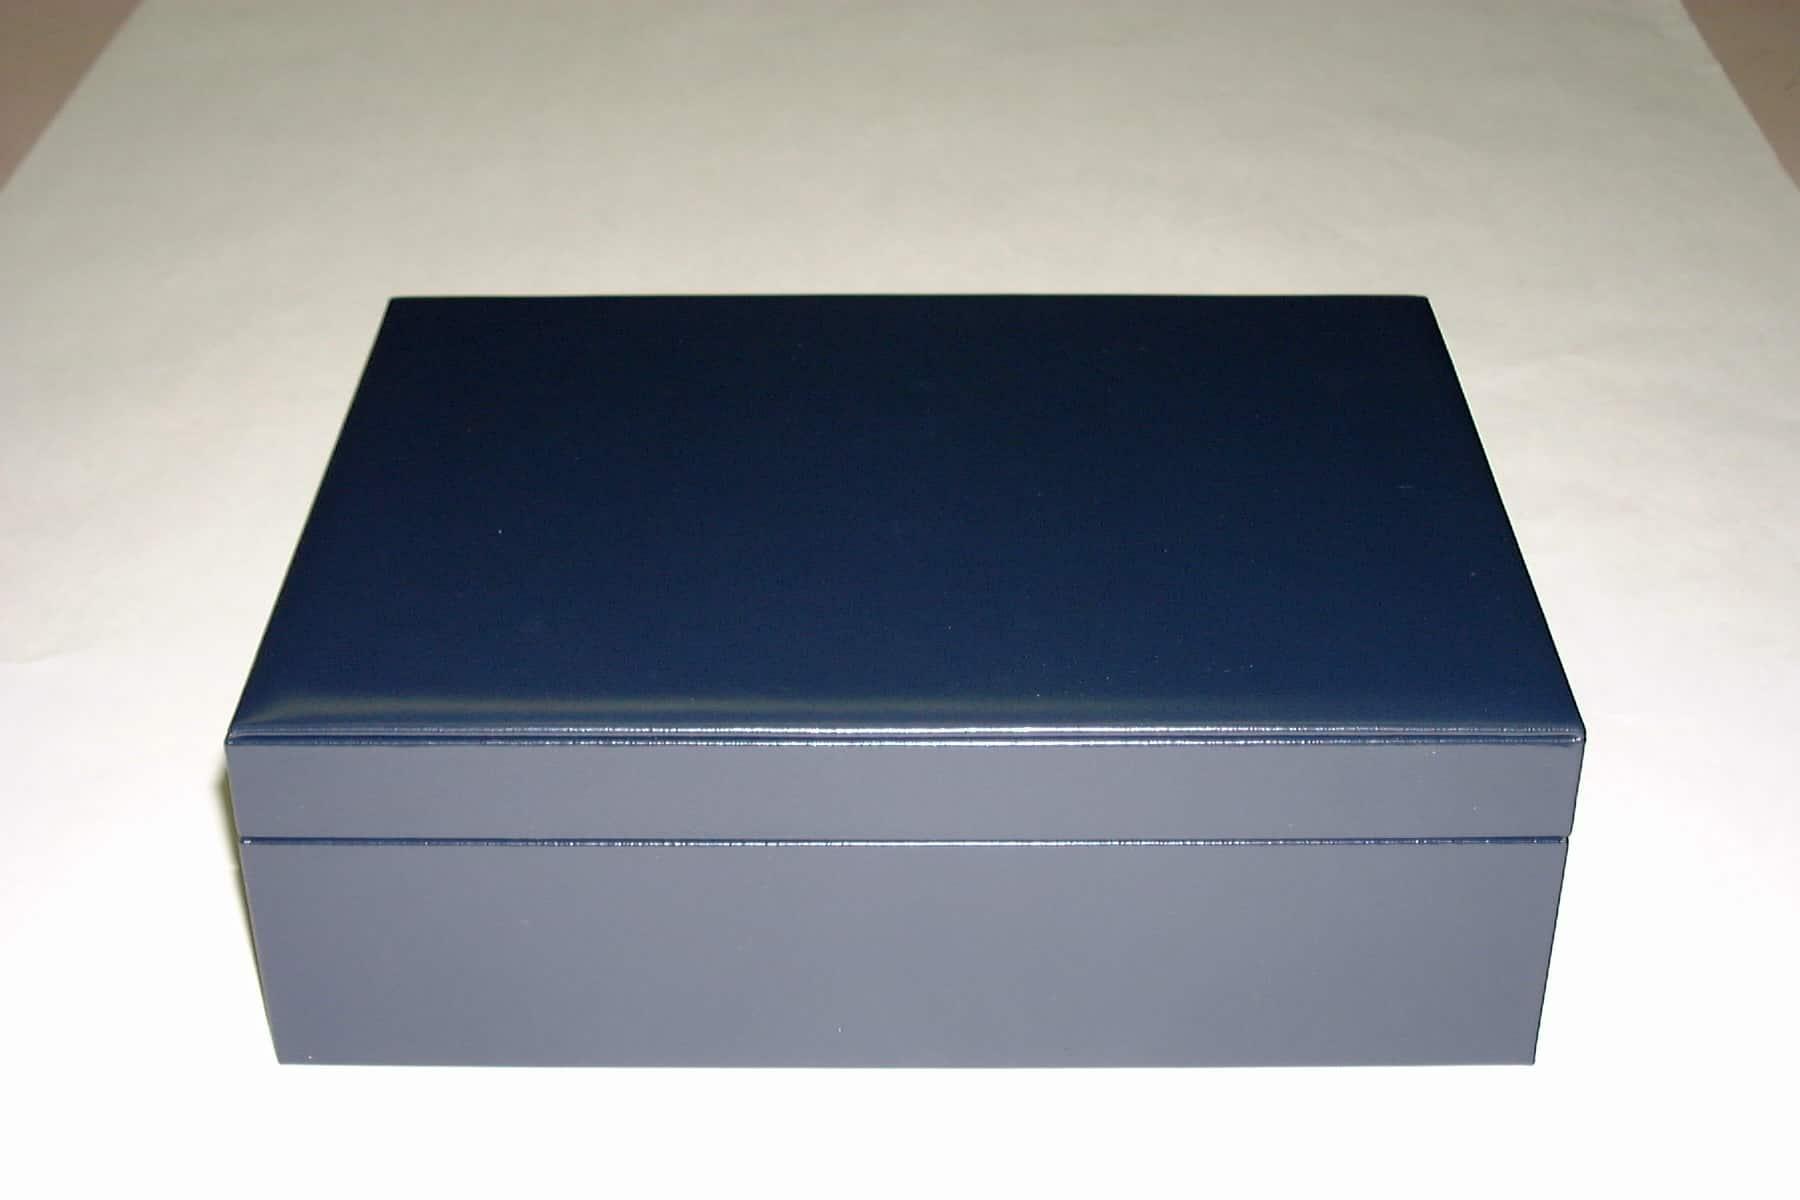 jewelery box imitation leather